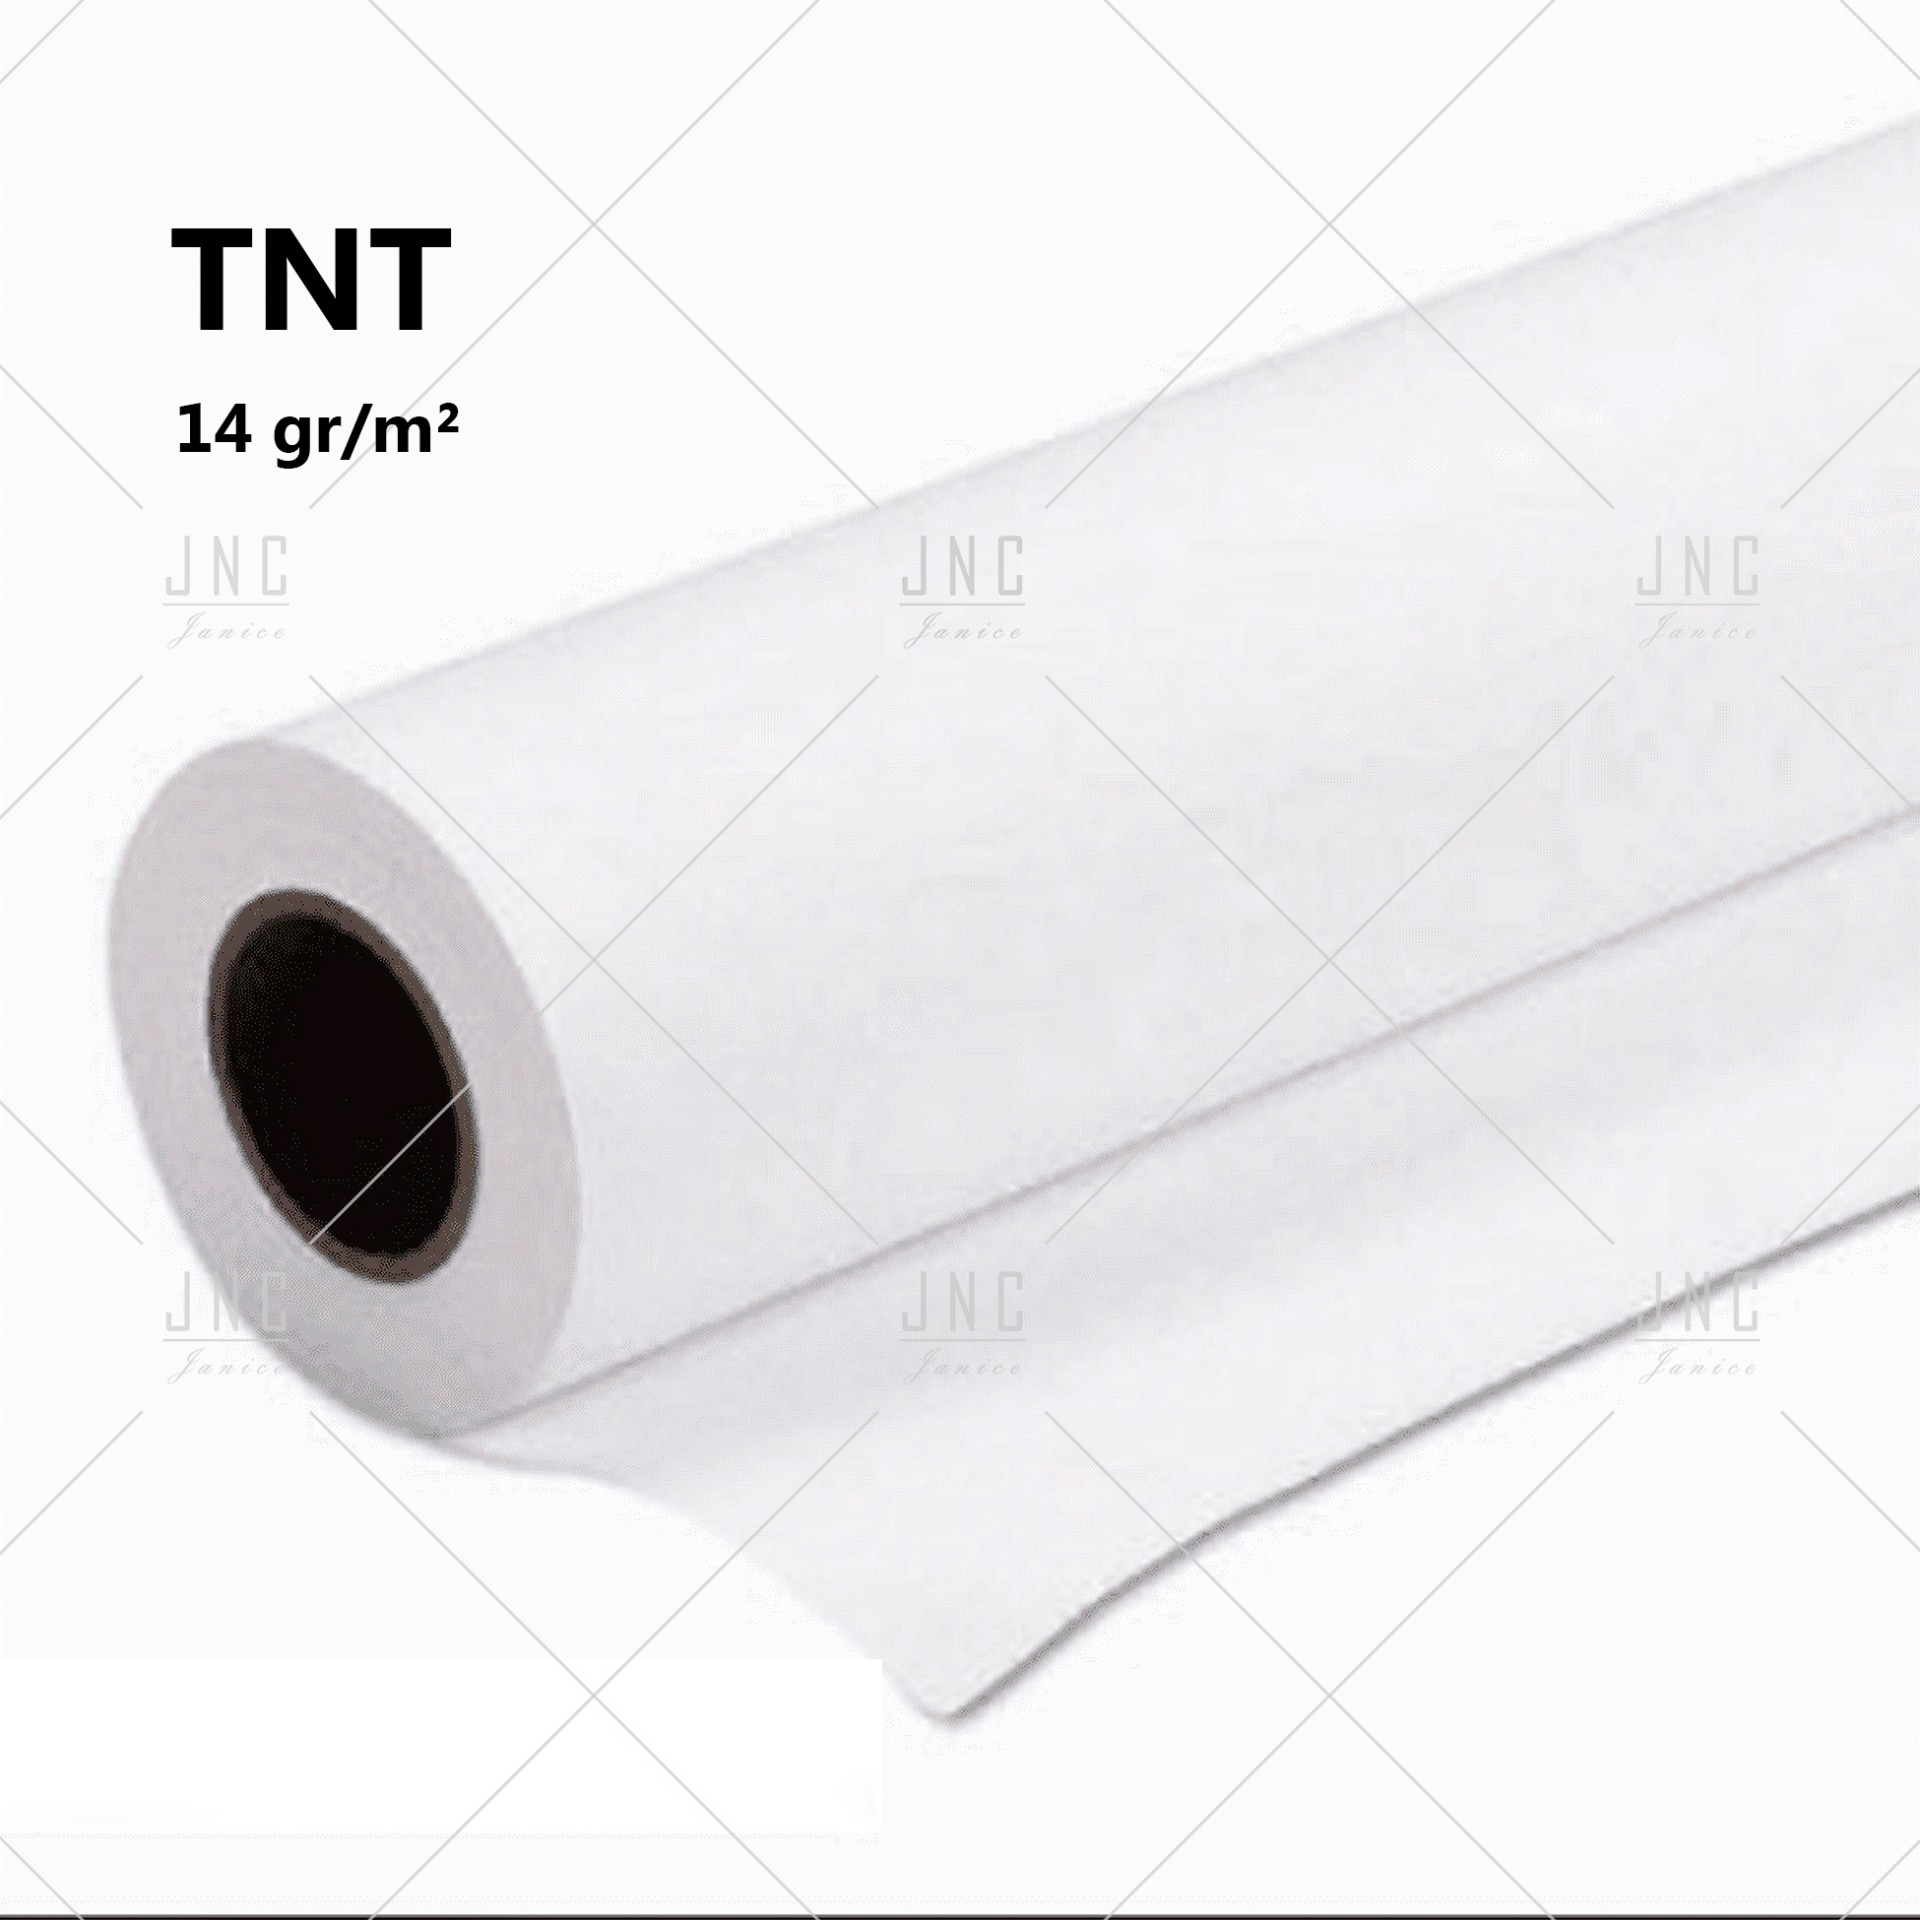 2 Rolos para Marquesa TNT 14 gr/m² | Ref.146080